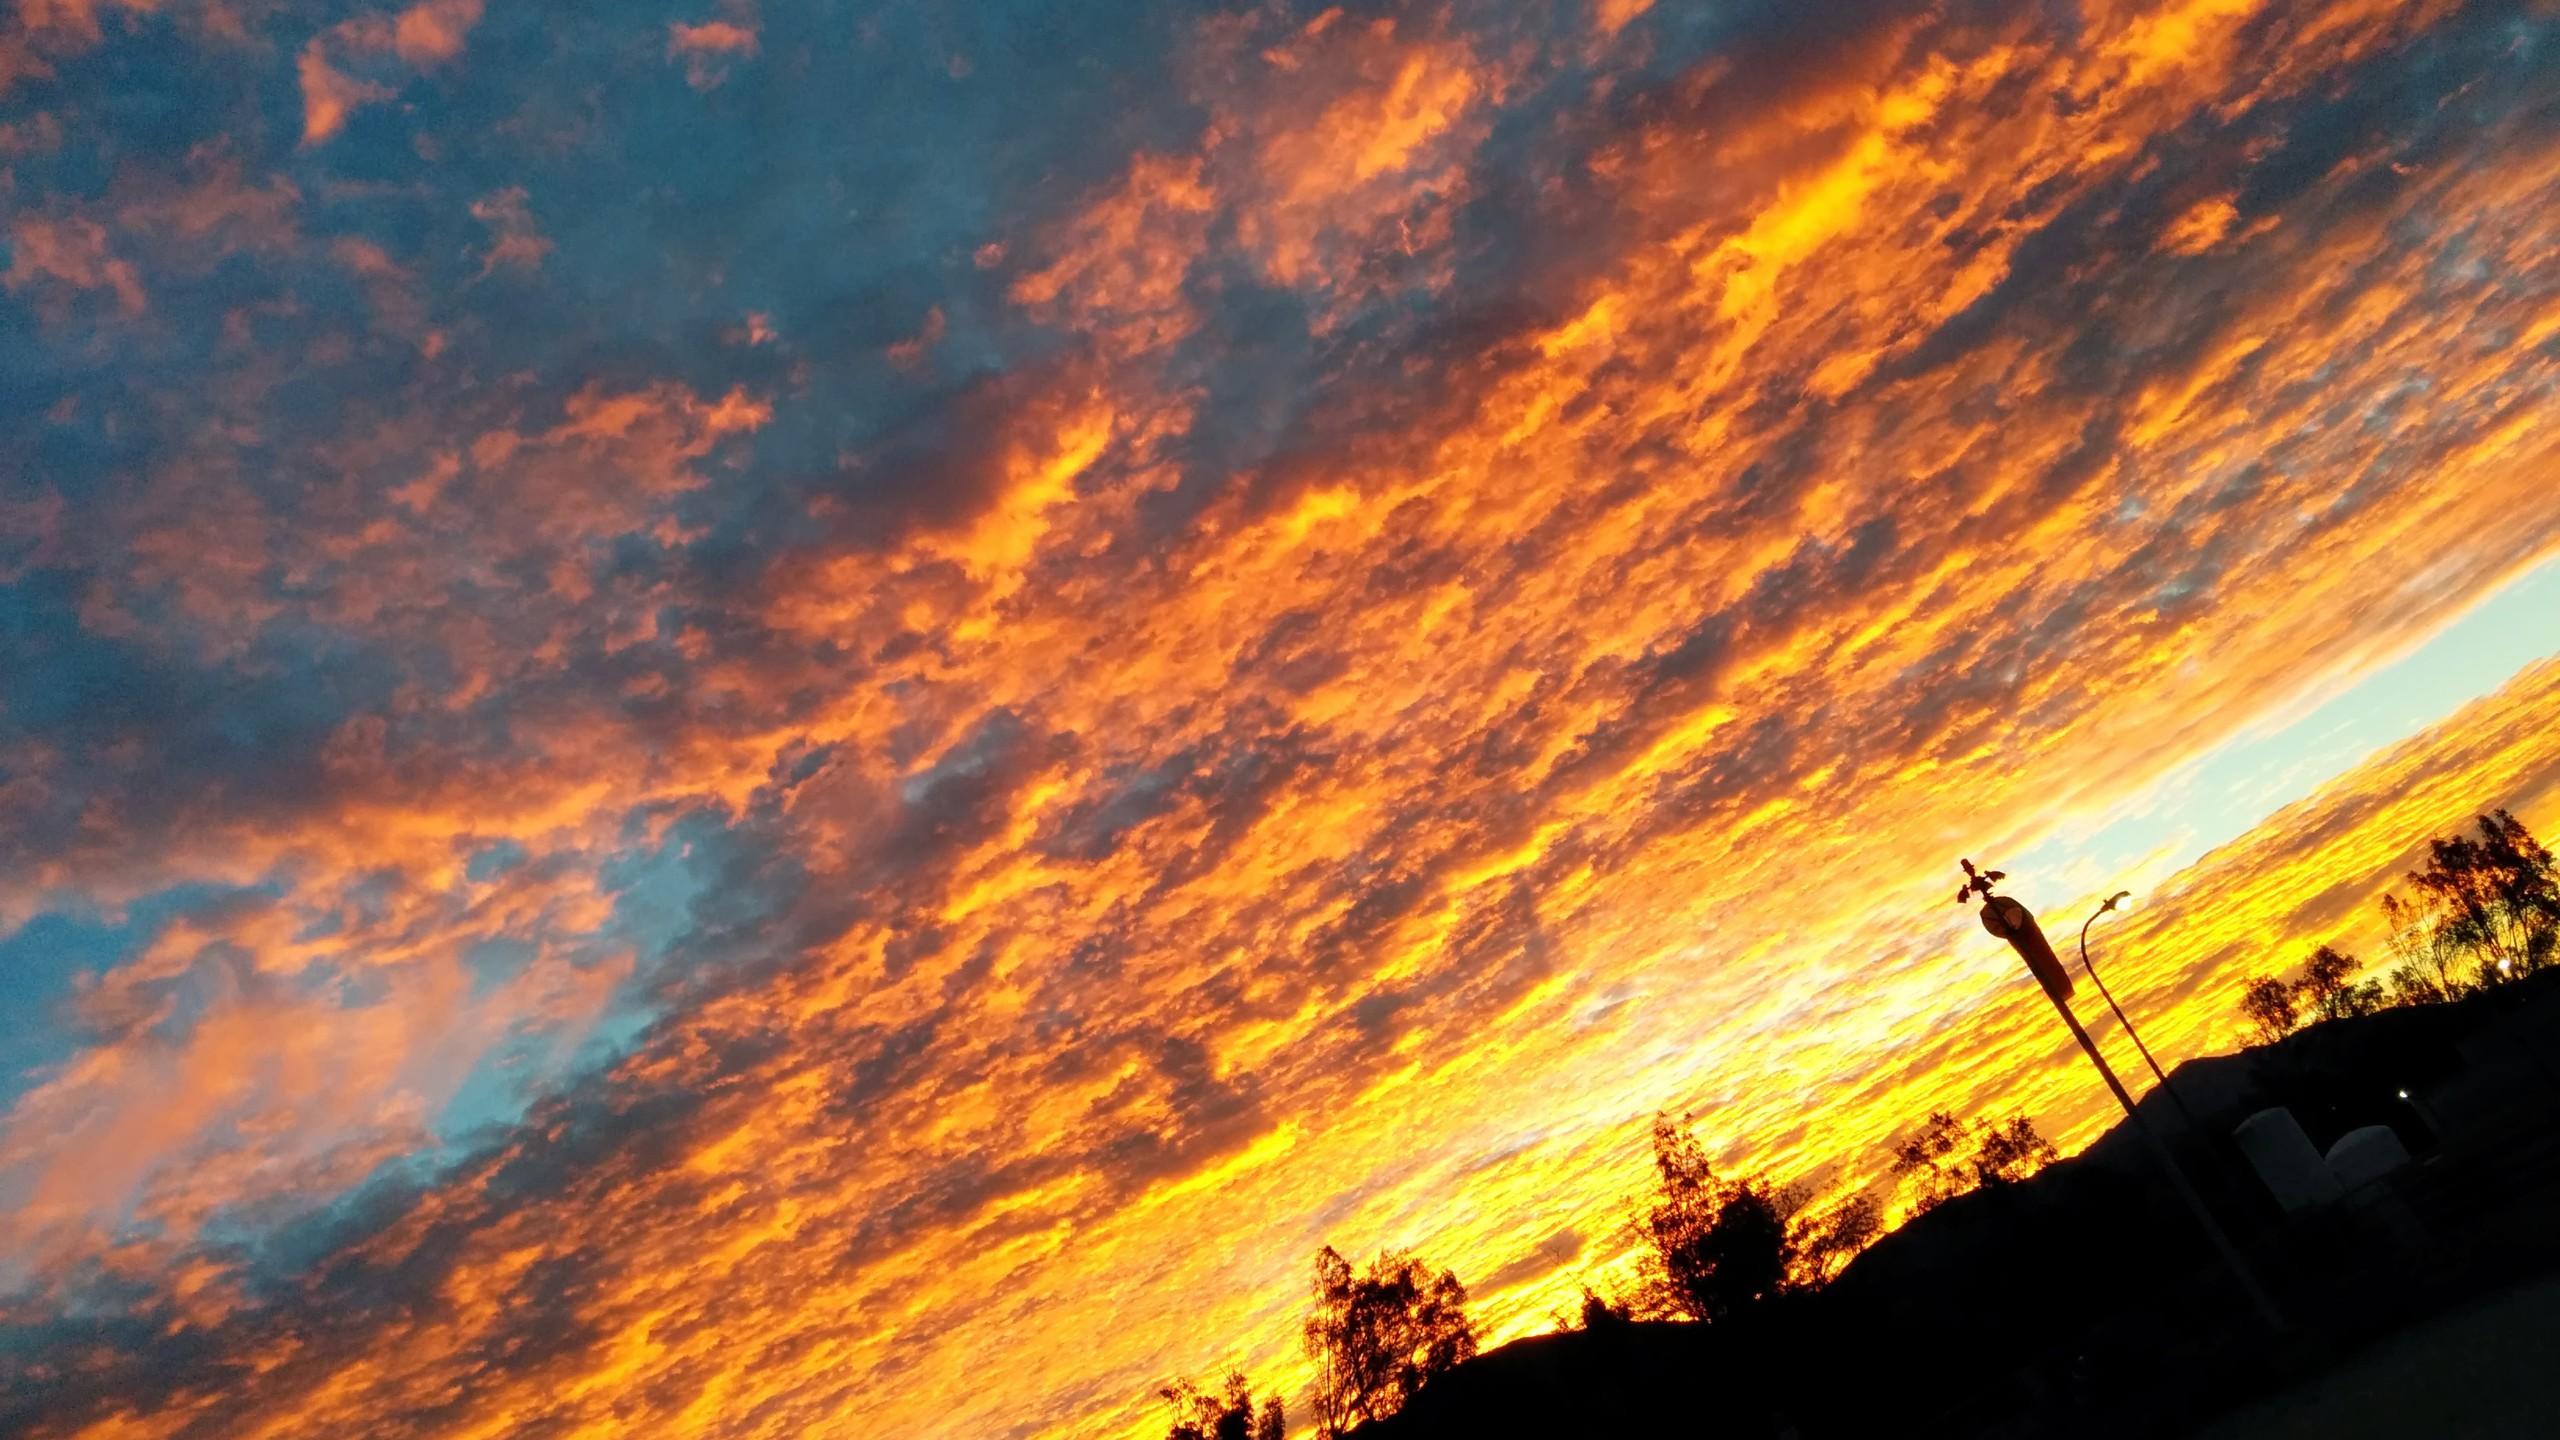 BOTPOST] Sunrise on a Helipad Sylmar California iimgurcom 2560x1440